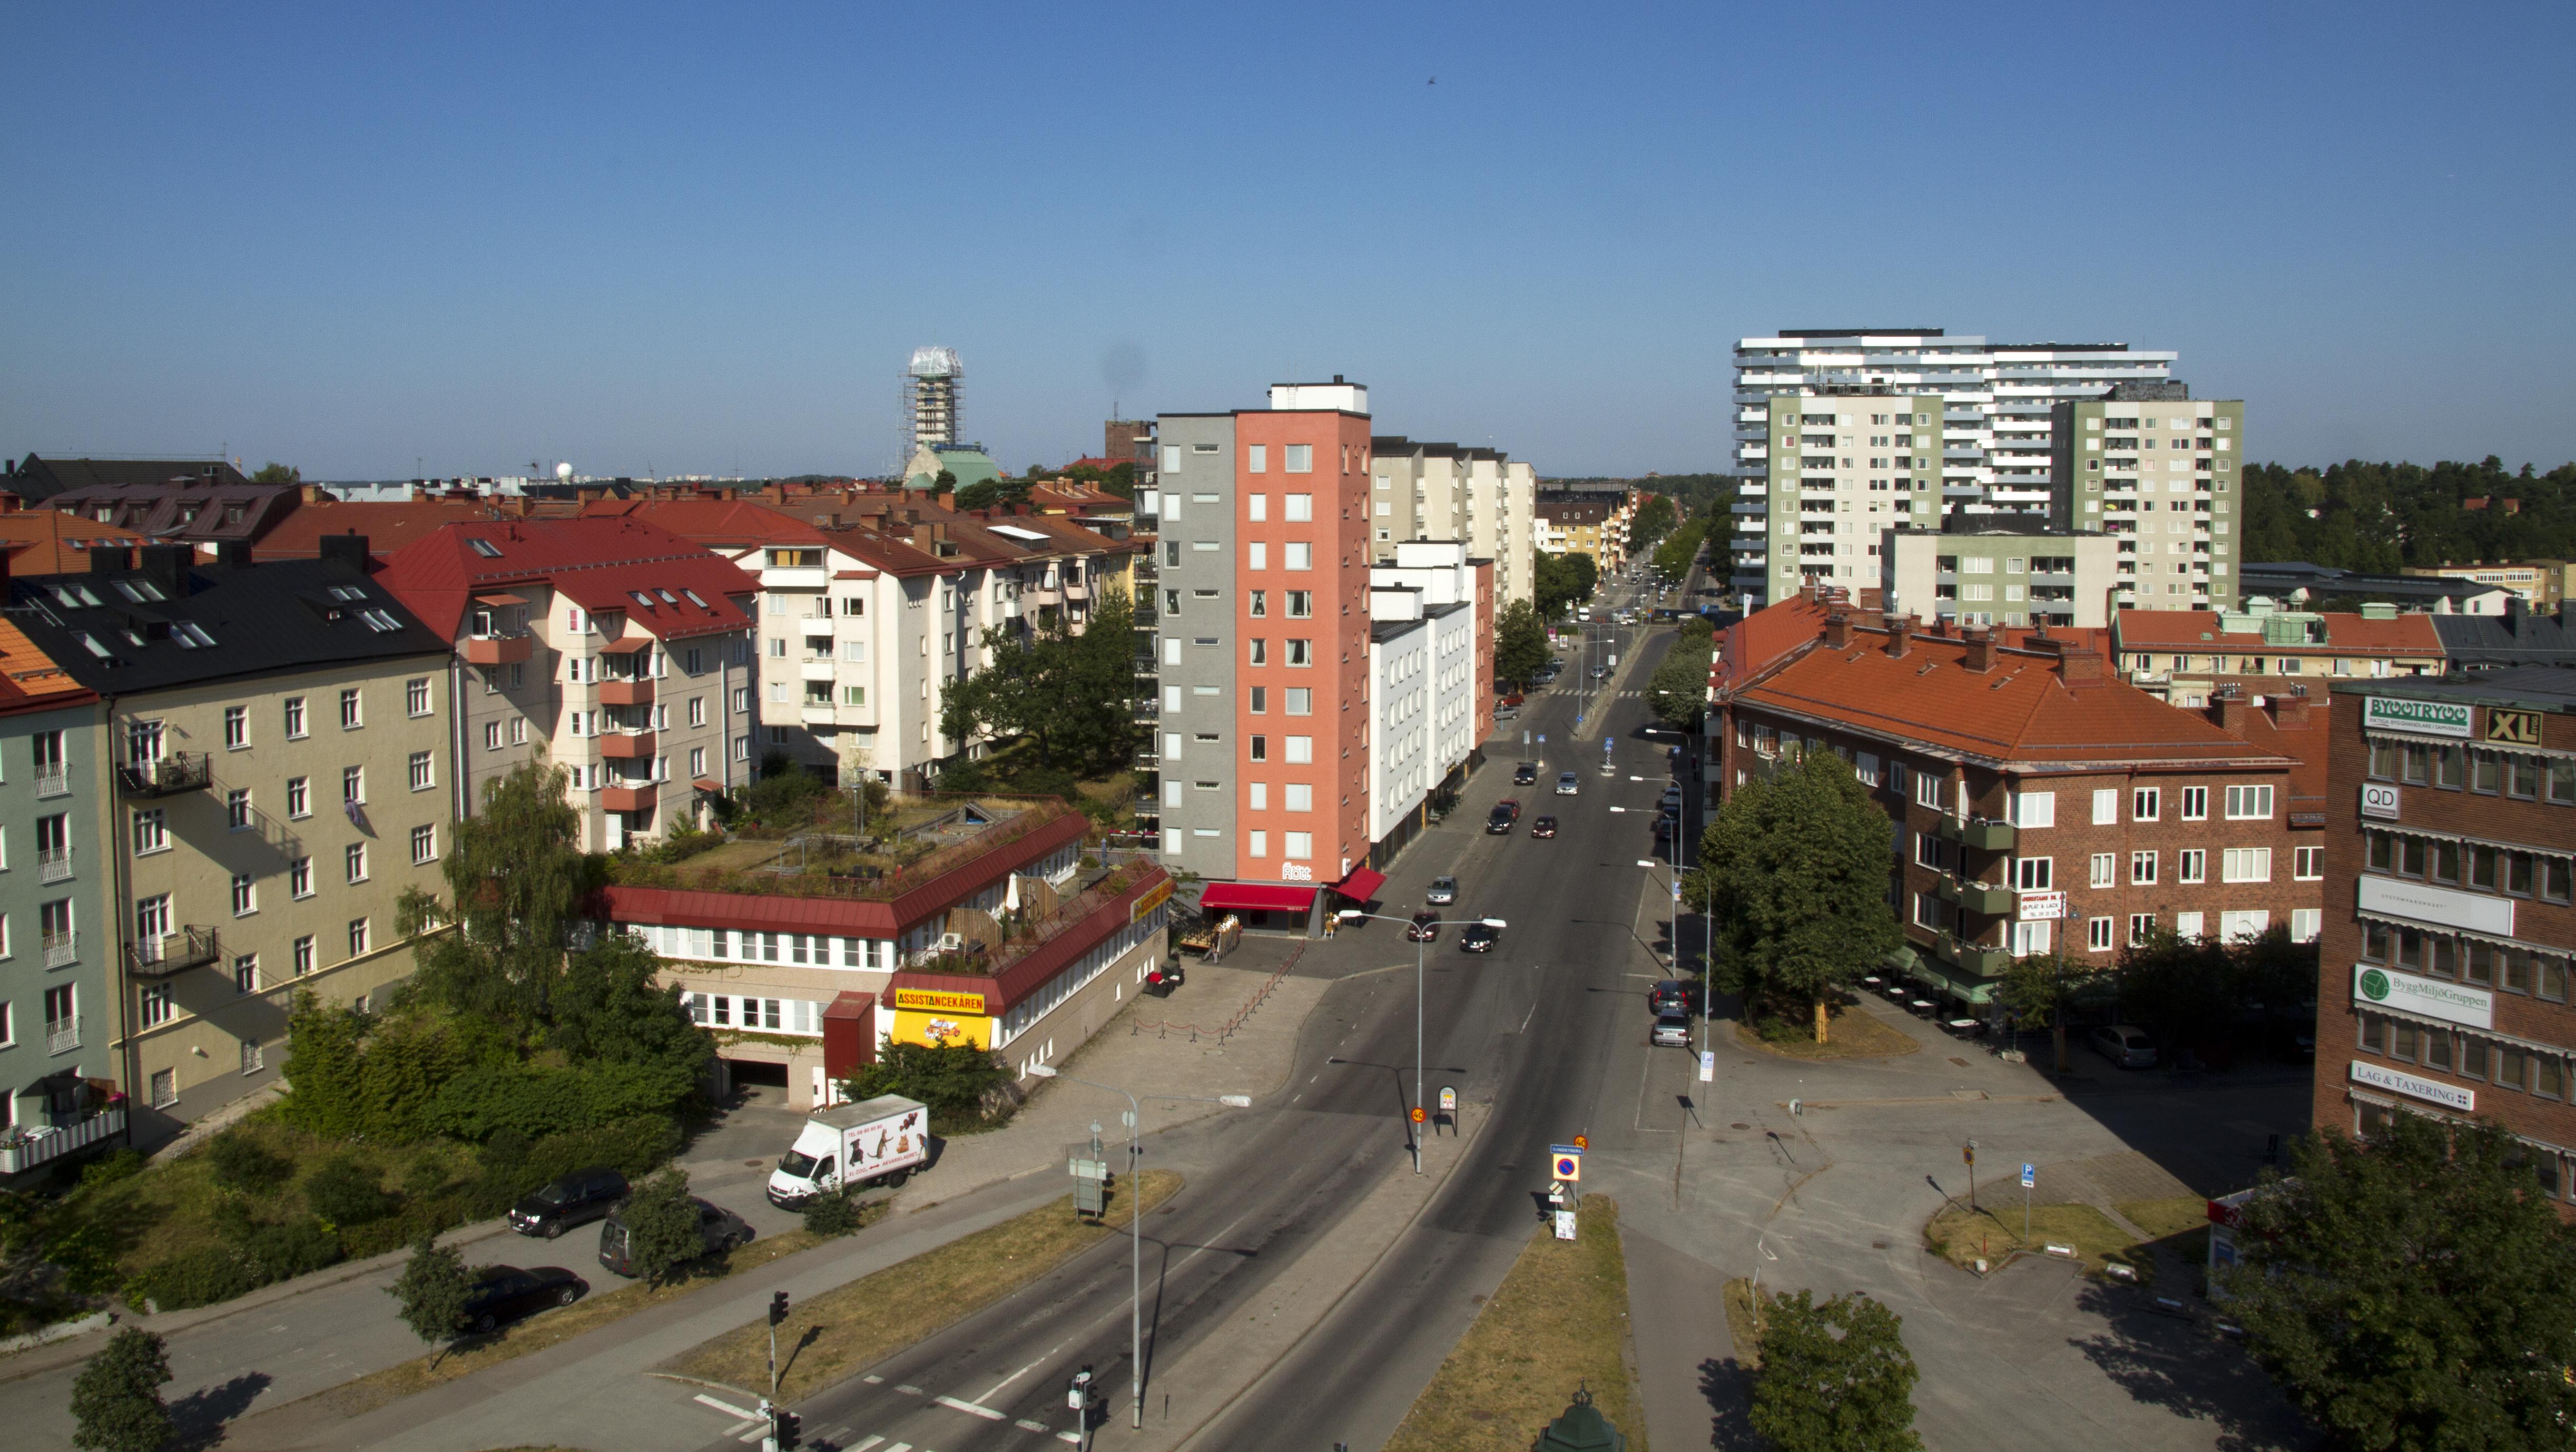 Gratis Chat Dating Sites Rsunda Escort Trondheim